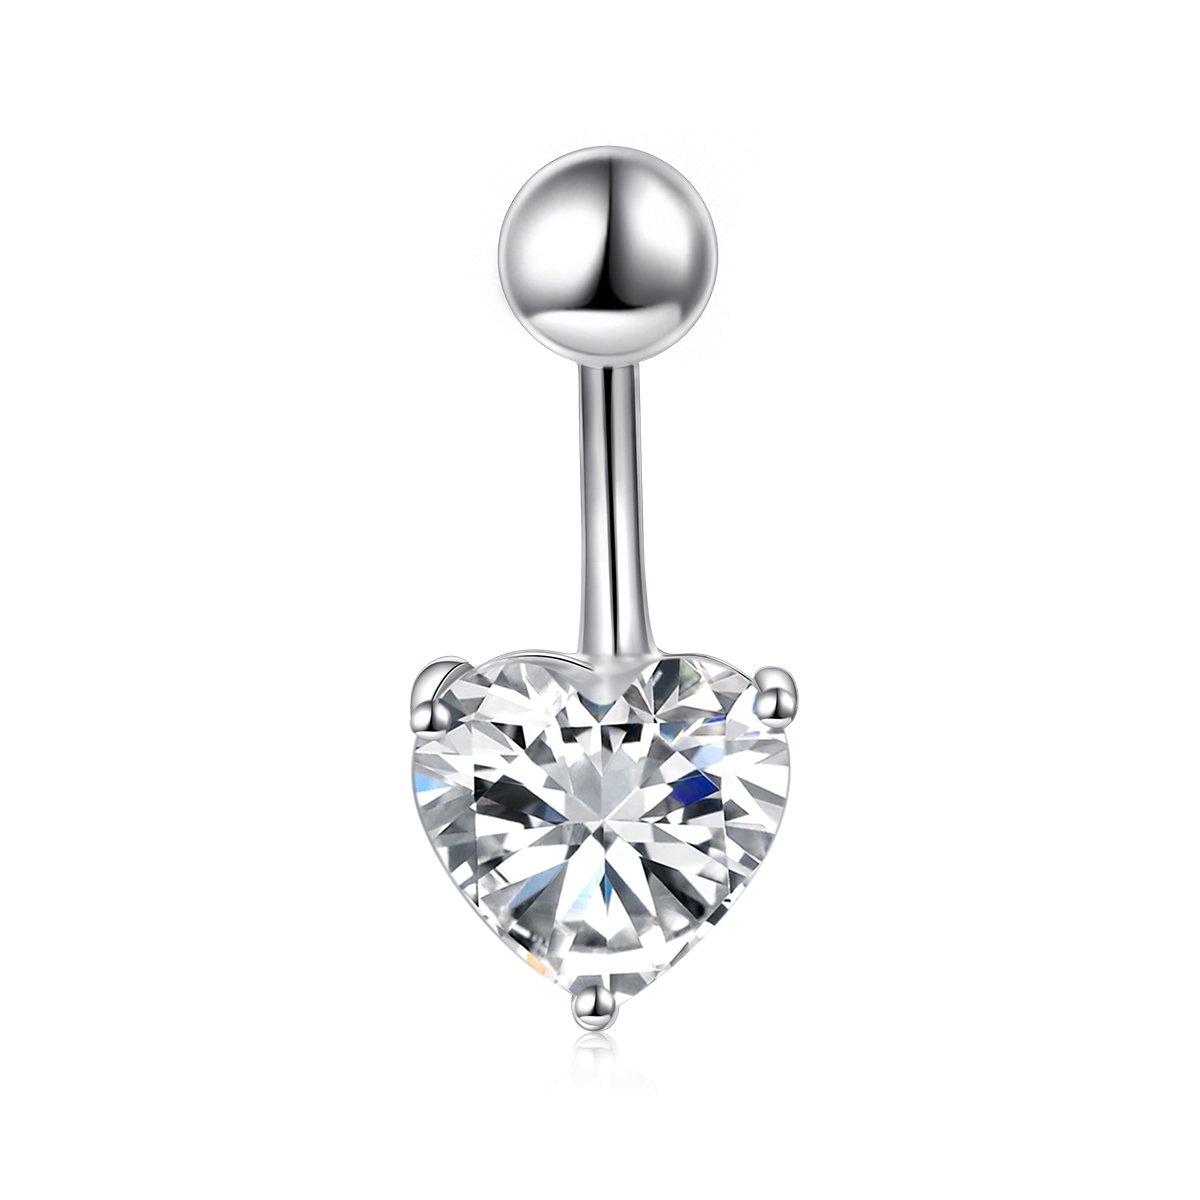 DAOCHONG Sterling Silver Belly Button Rings for Women Girl Navel Rings CZ Body Piercing by DAOCHONG